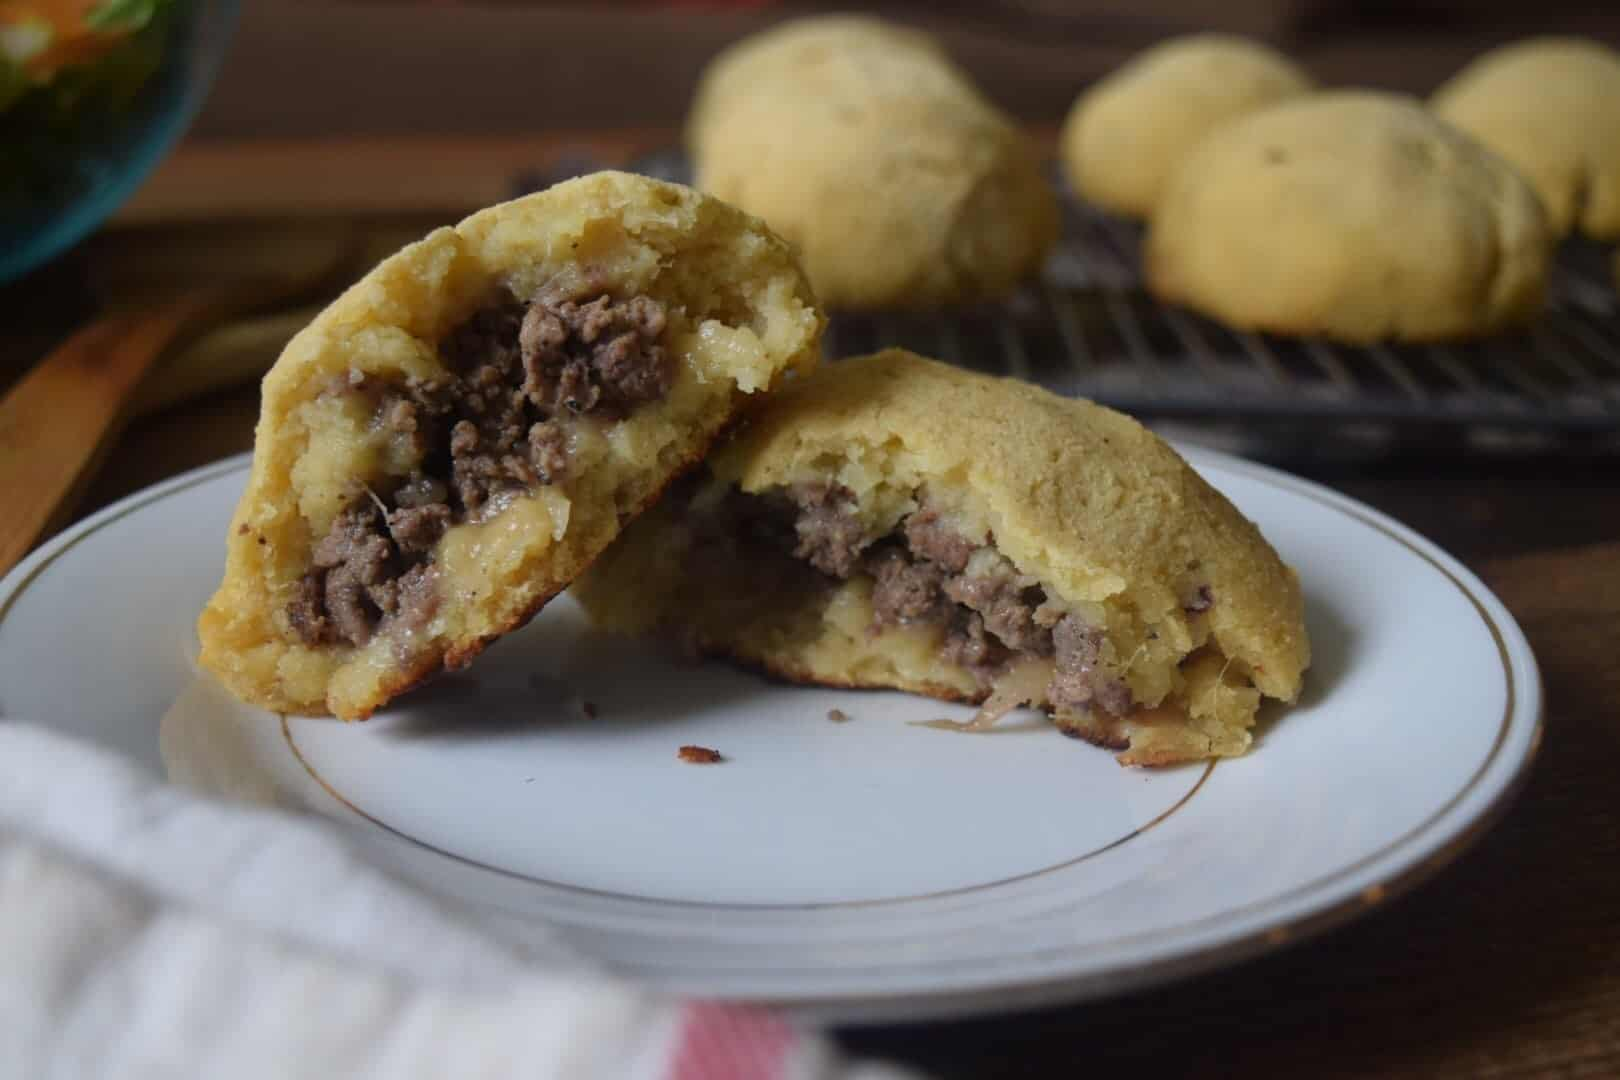 sweet potato buns stuffed with meat